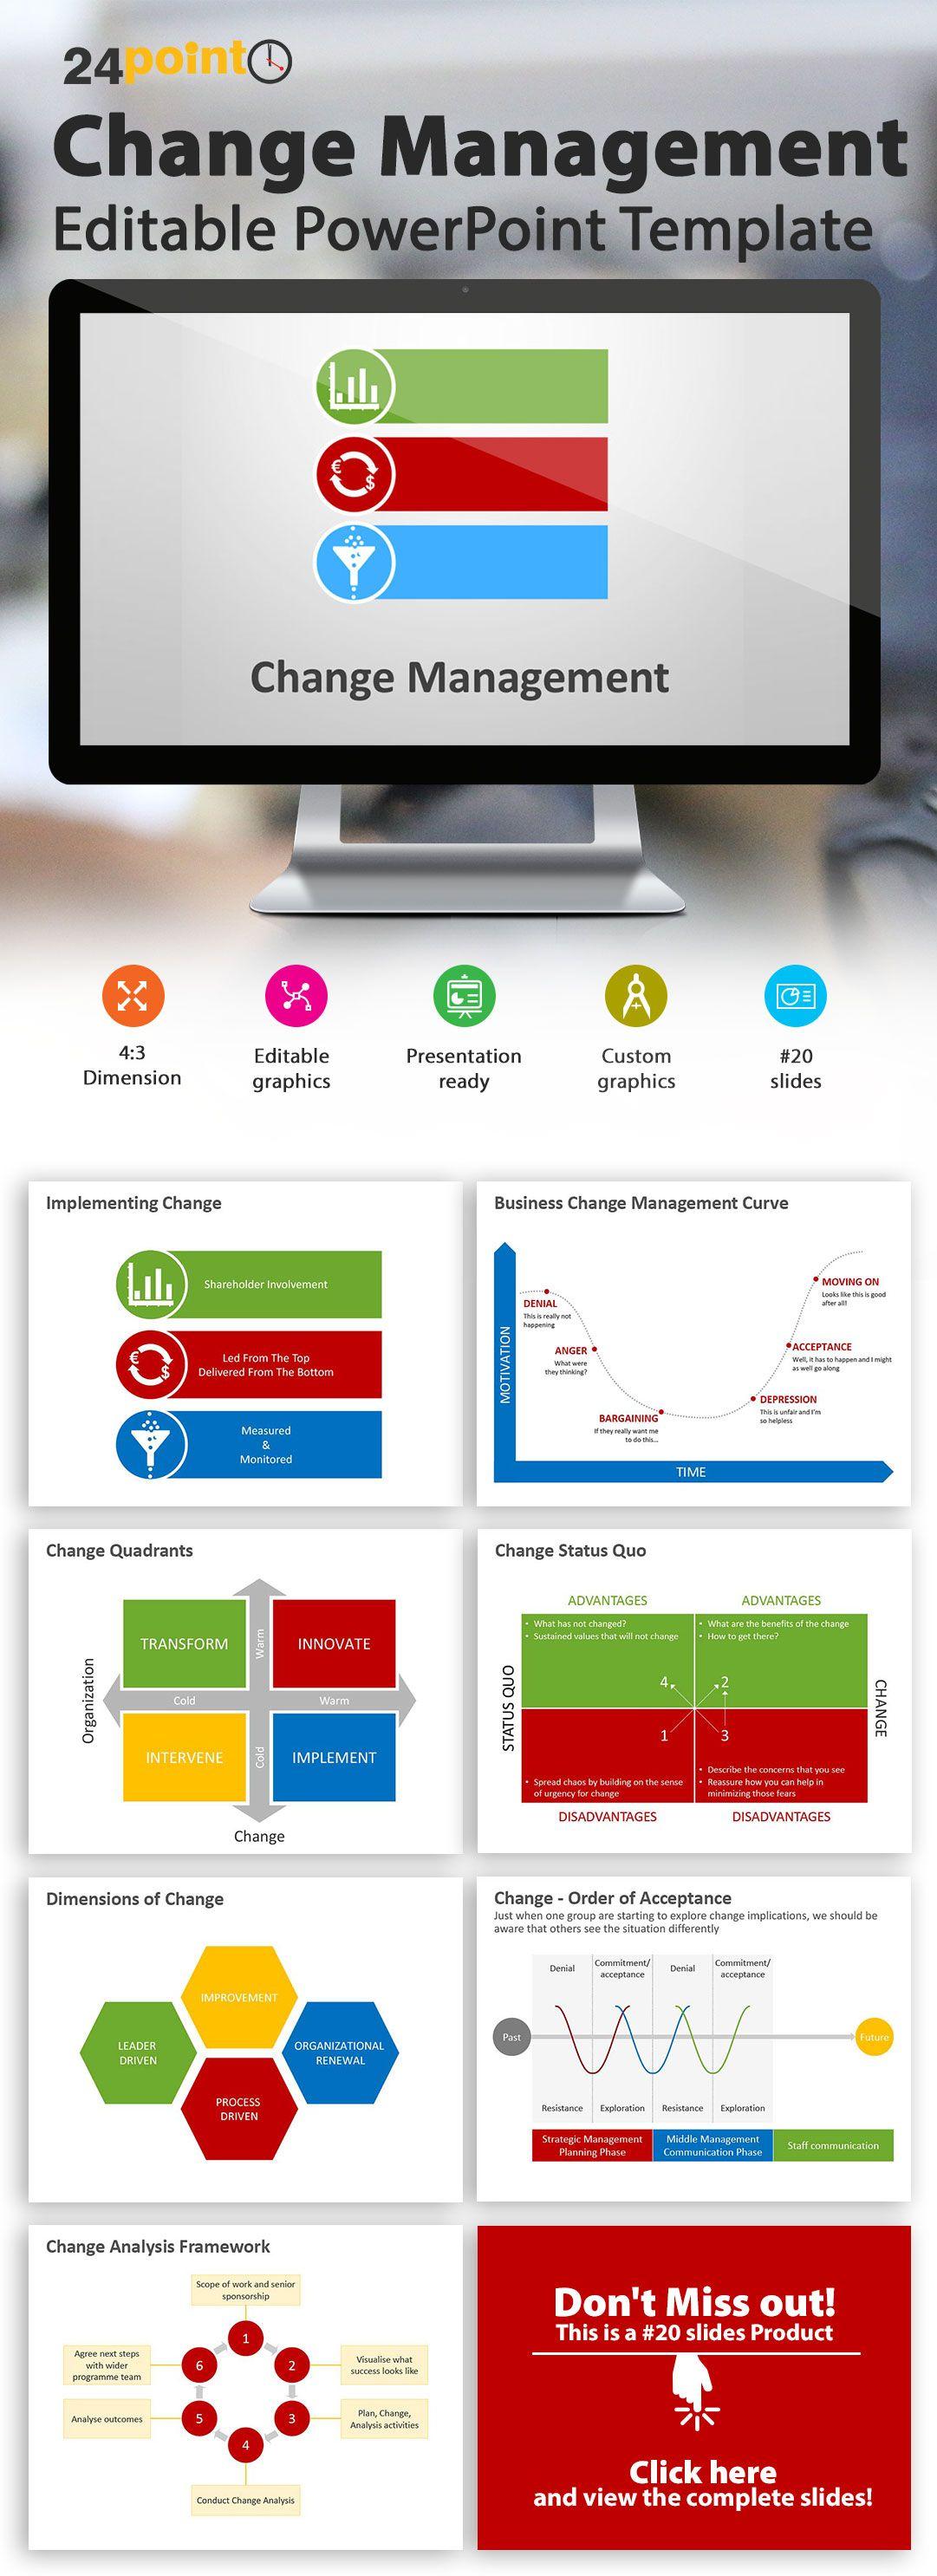 Editable powerpoint templates change management business concepts editable powerpoint templates change management toneelgroepblik Image collections